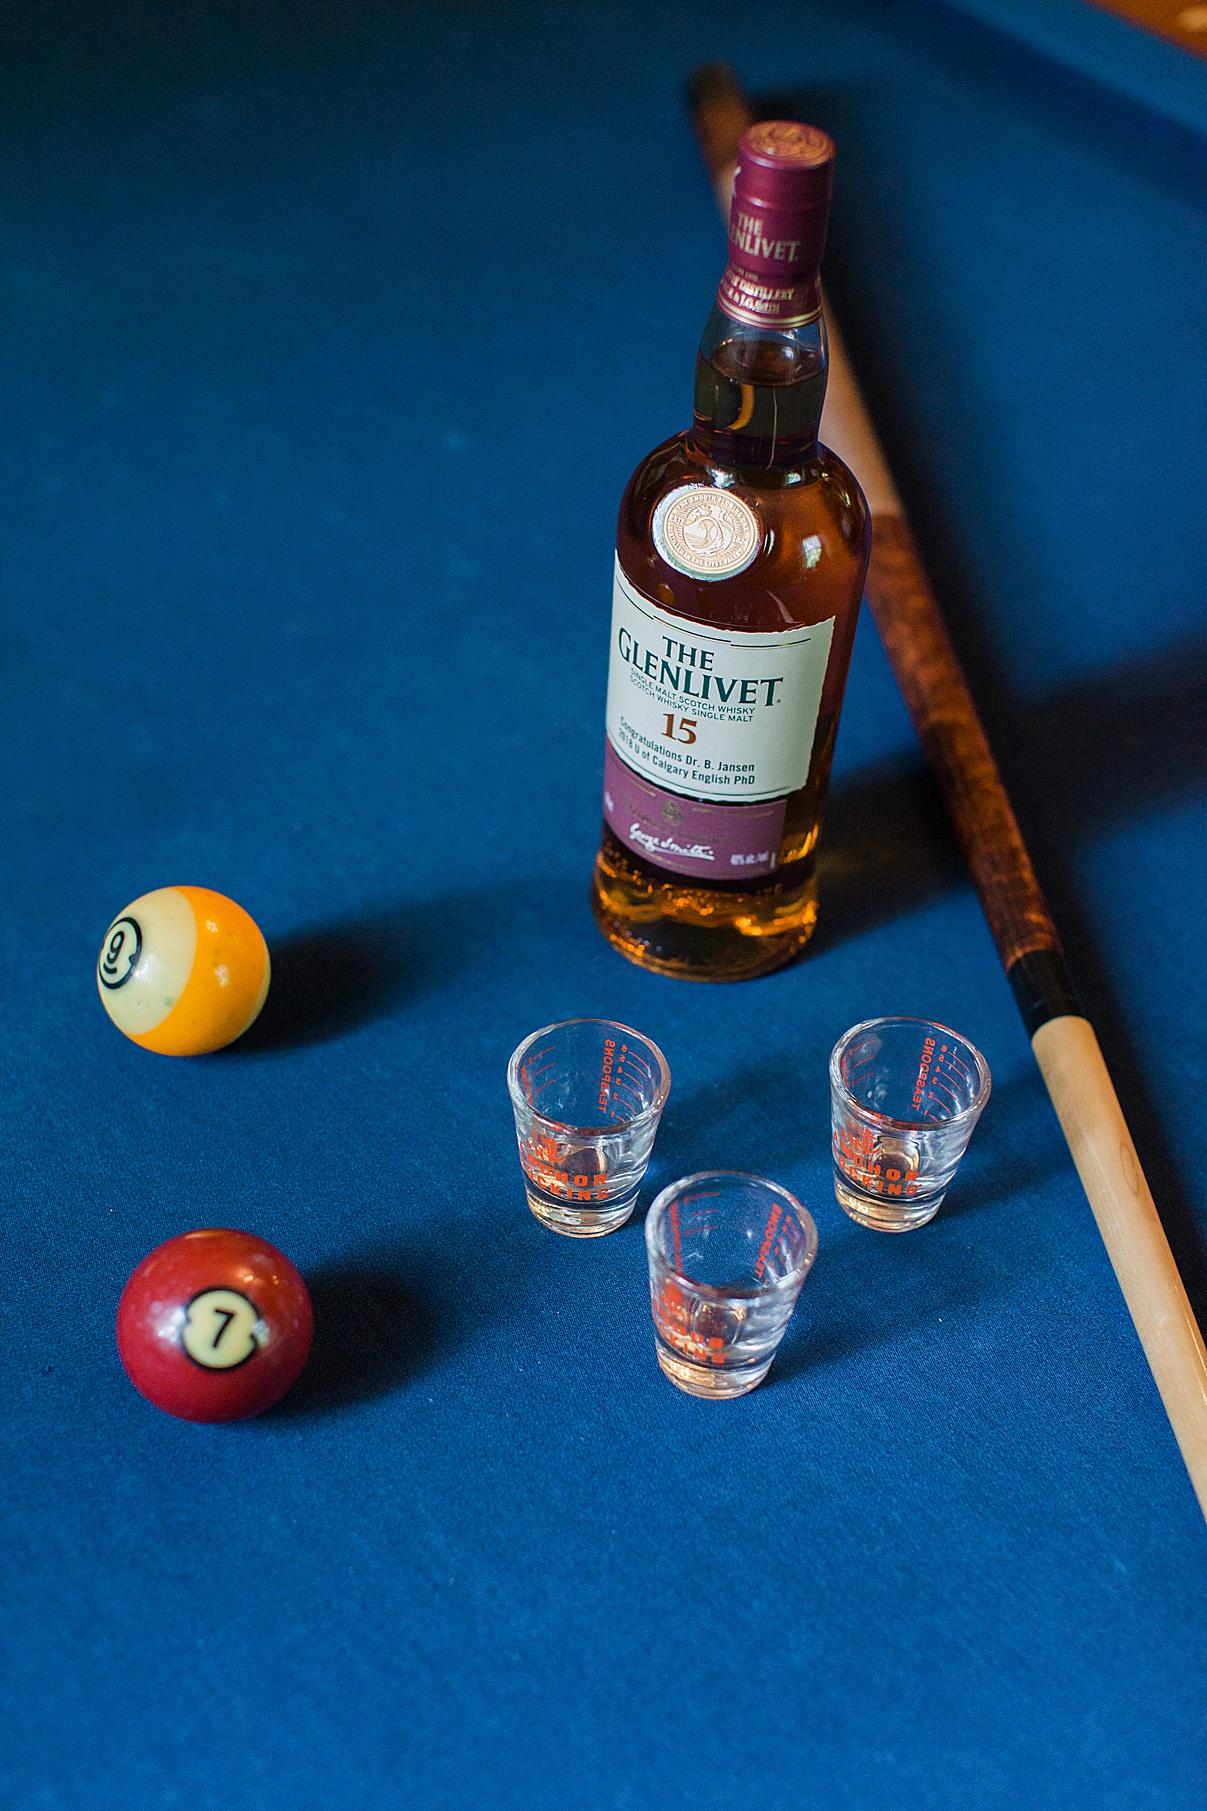 Bottle of Scotch and pool table | Balls Falls, Ontario Wedding| Ontario Wedding Photographer| Toronto Wedding Photographer| 3Photography|3photography.ca